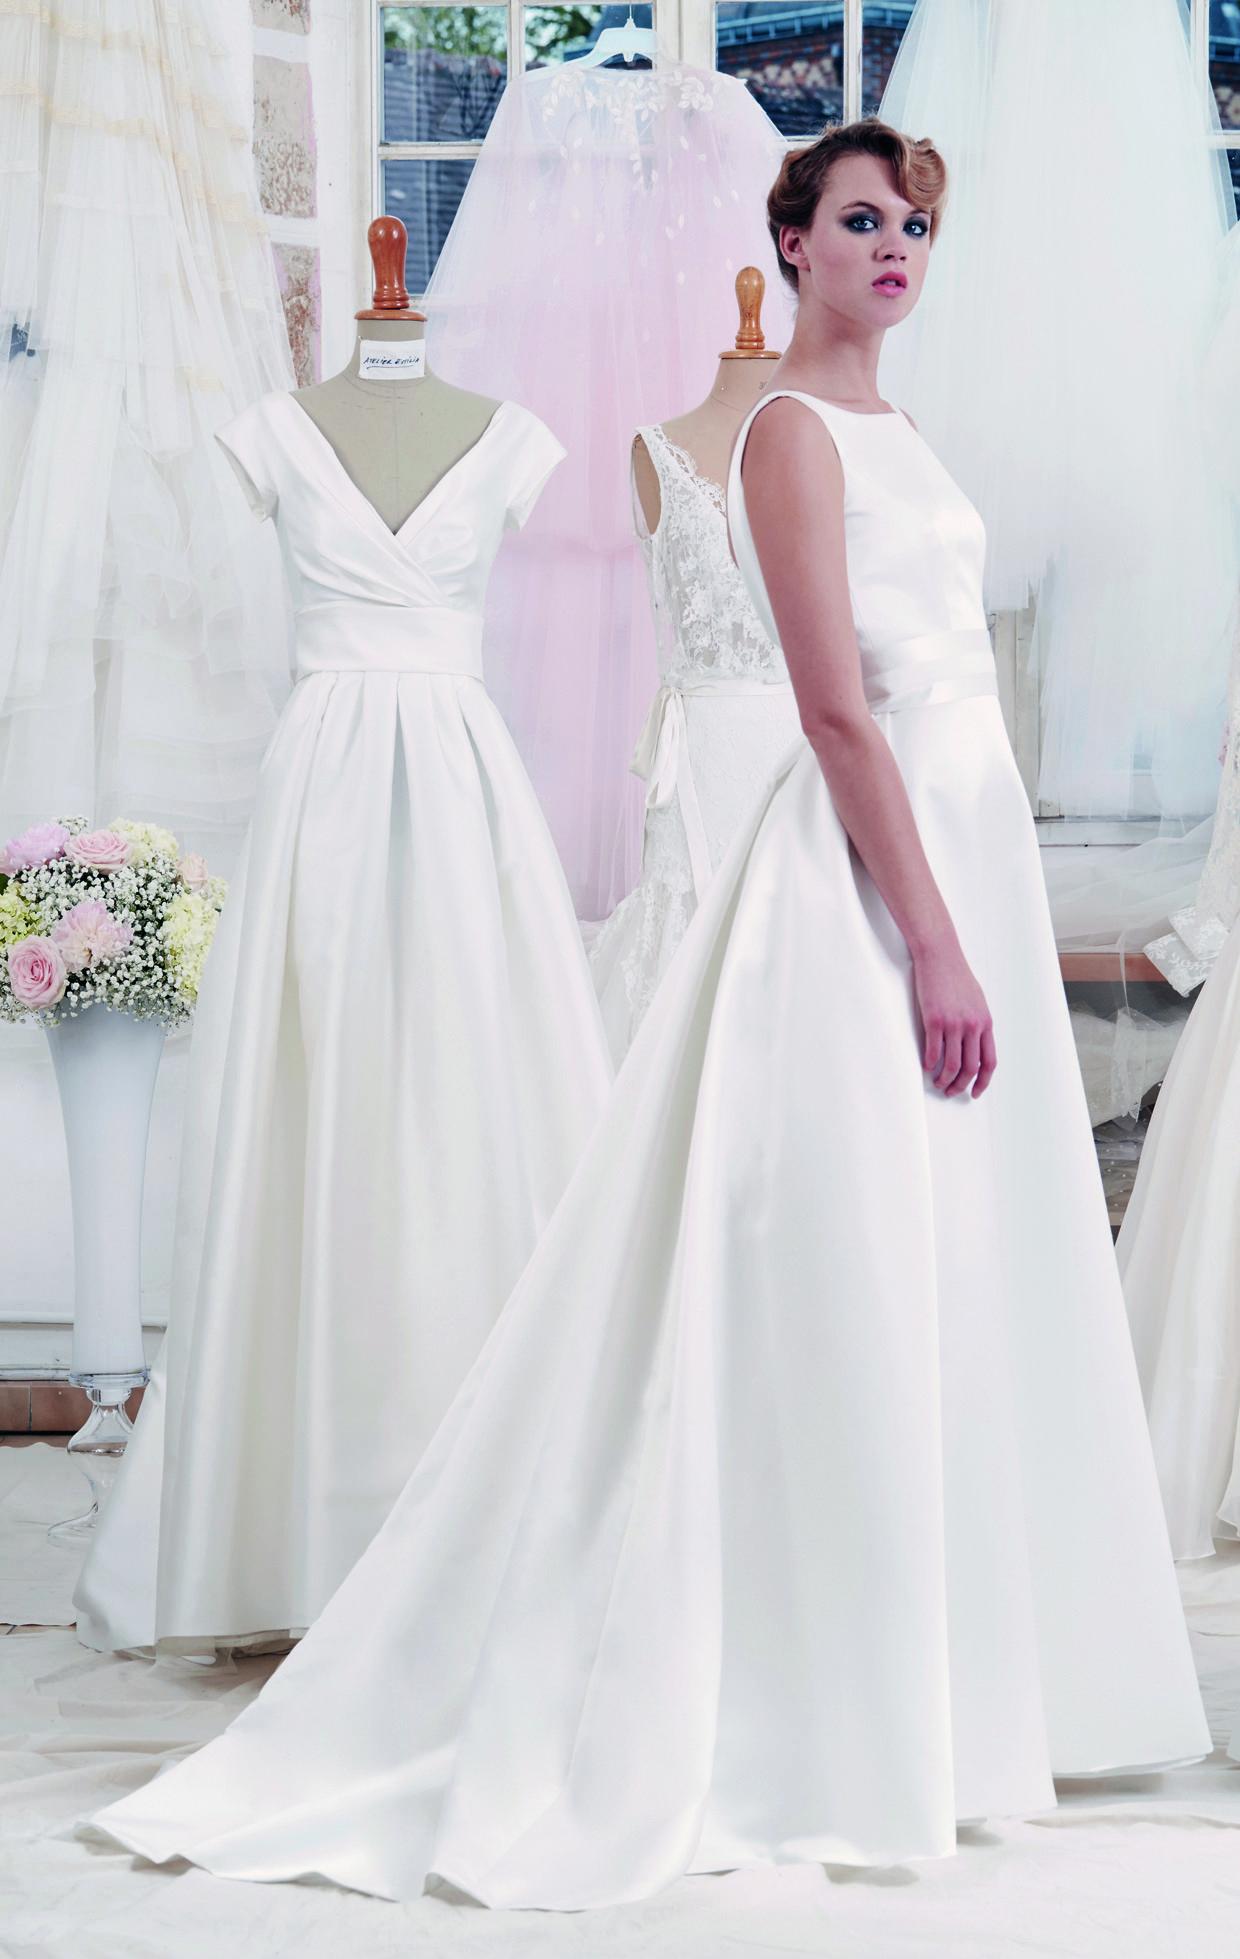 Robe ARMONIE - collection 2019 - robe de